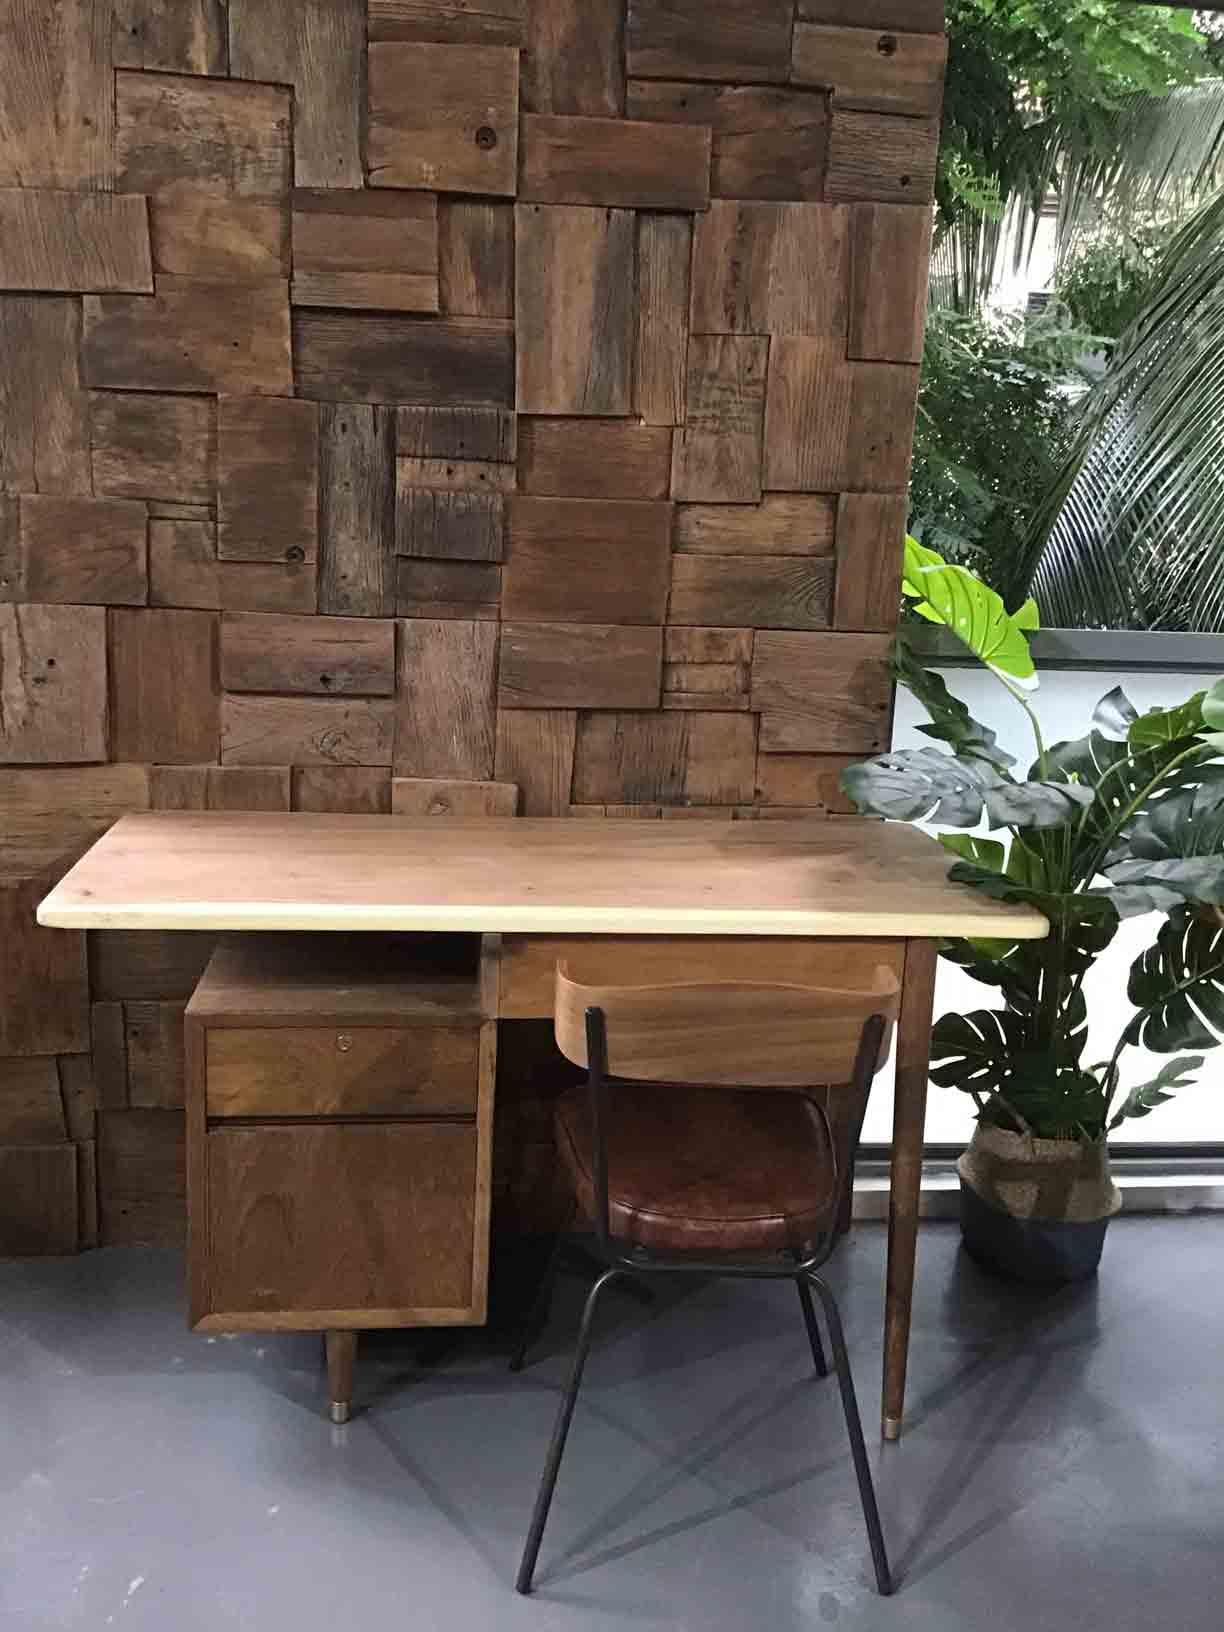 Live Edge Suar Wood Table for study